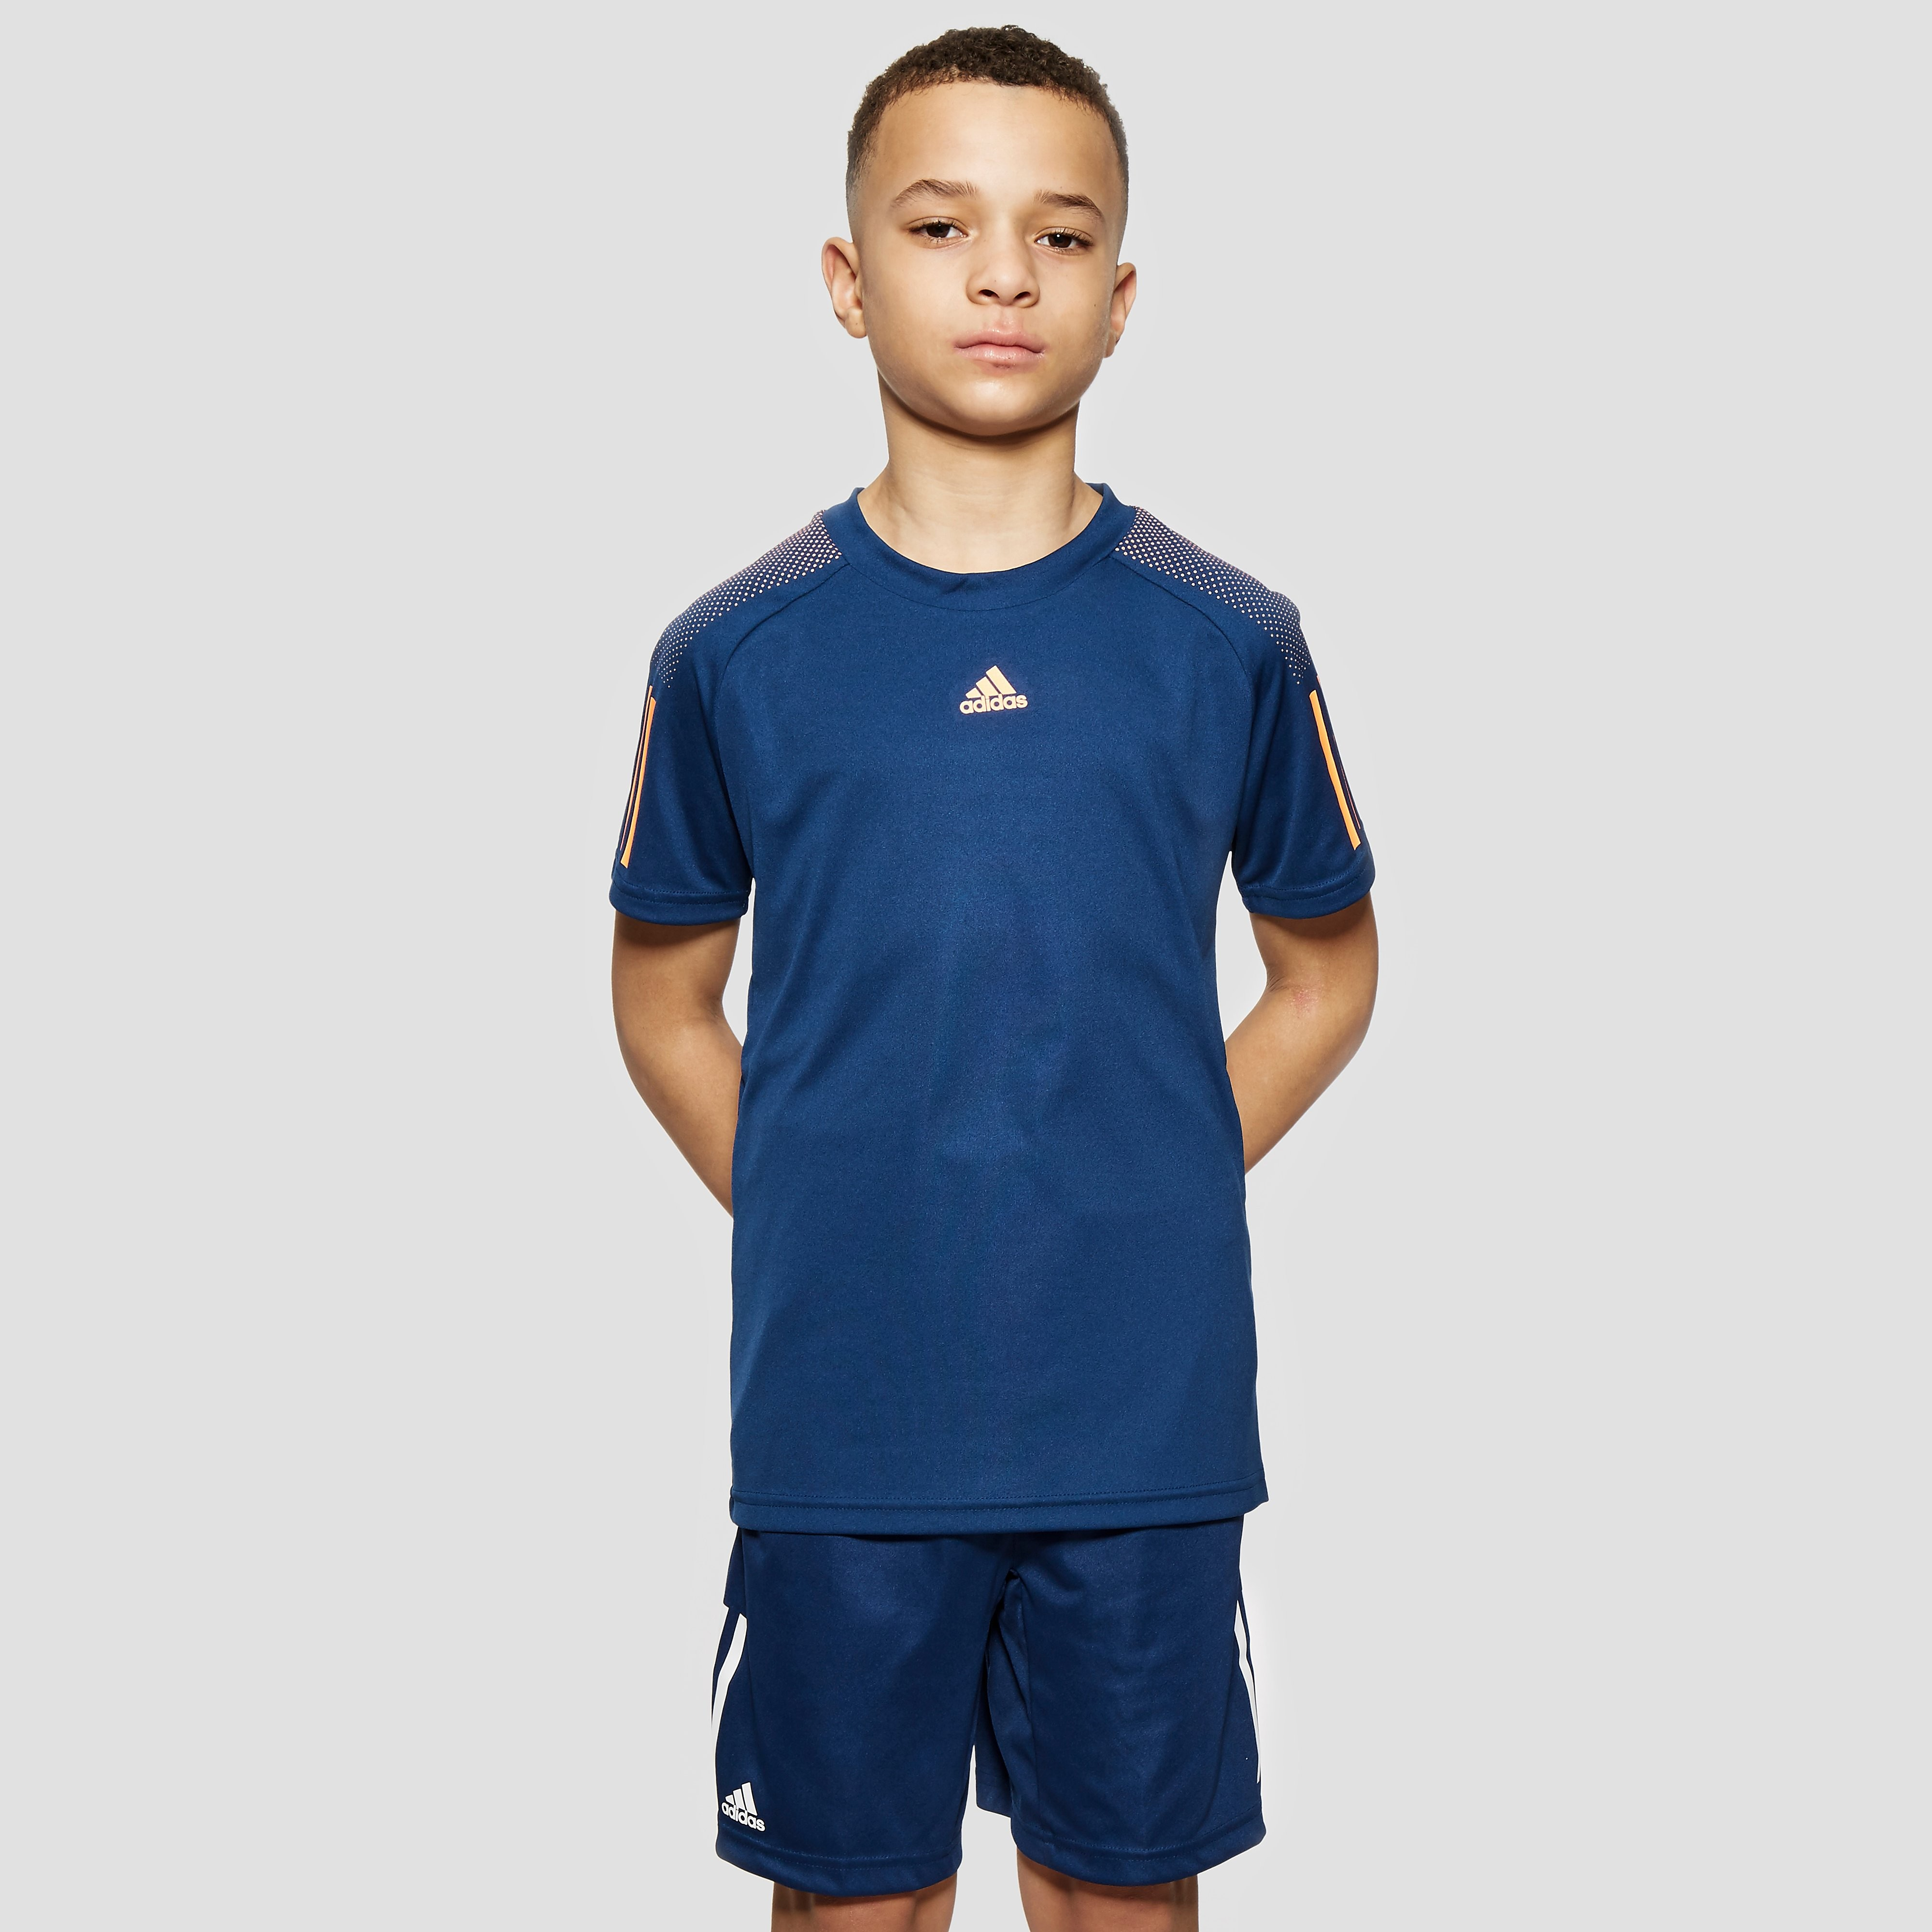 adidas Barricade Junior Tennis T-shirt